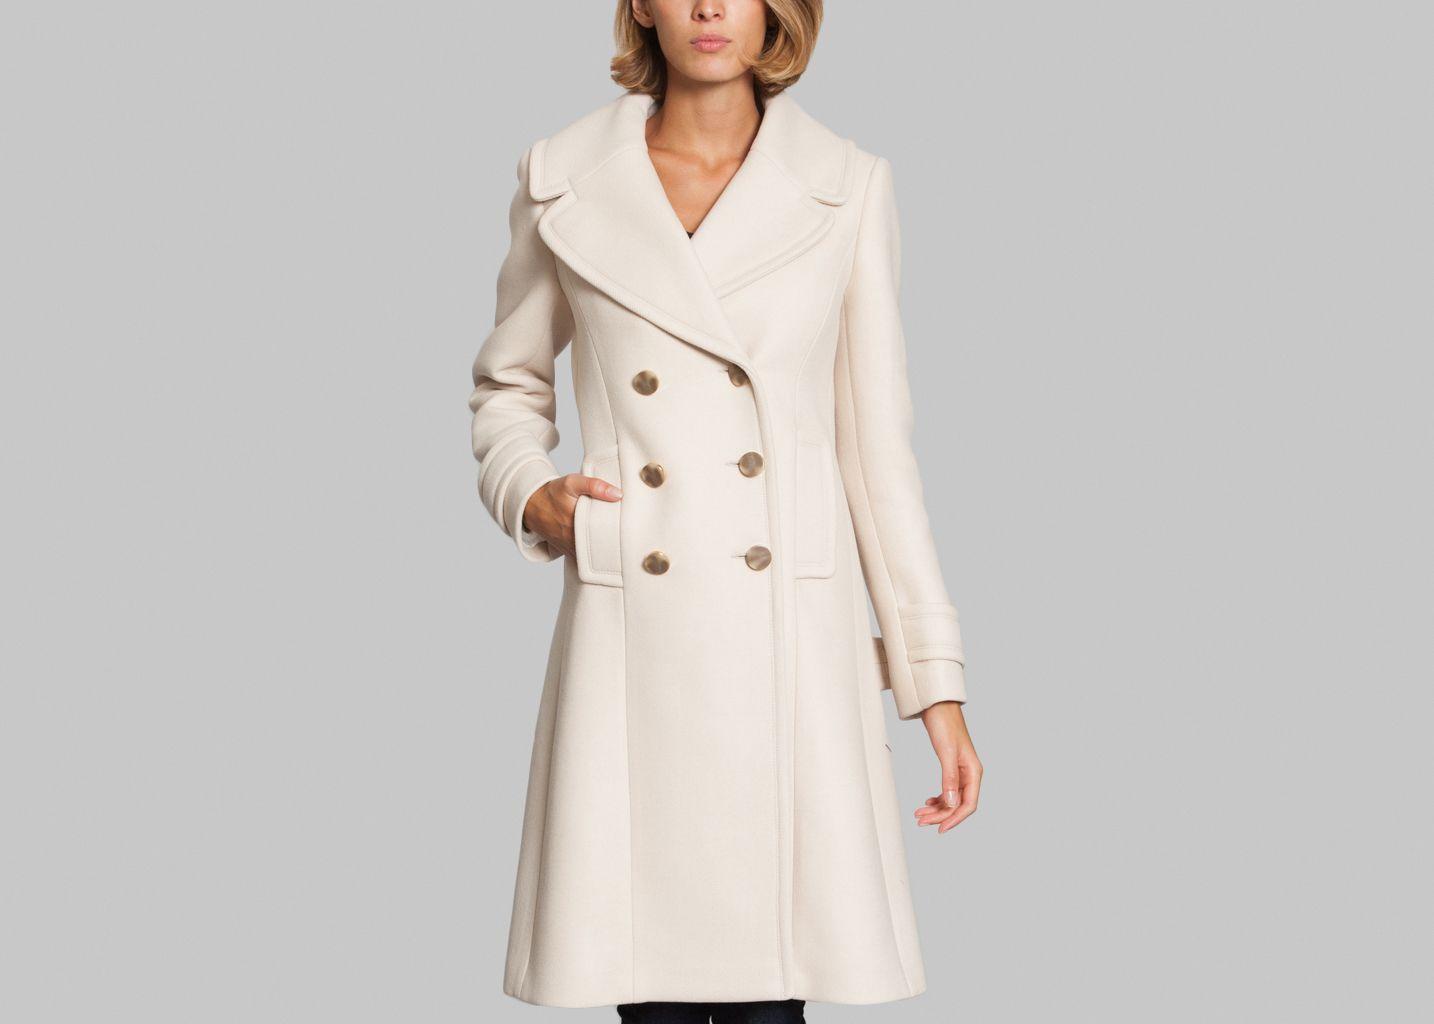 30f48572ca Elegance Coat BeigeTara Jarmon